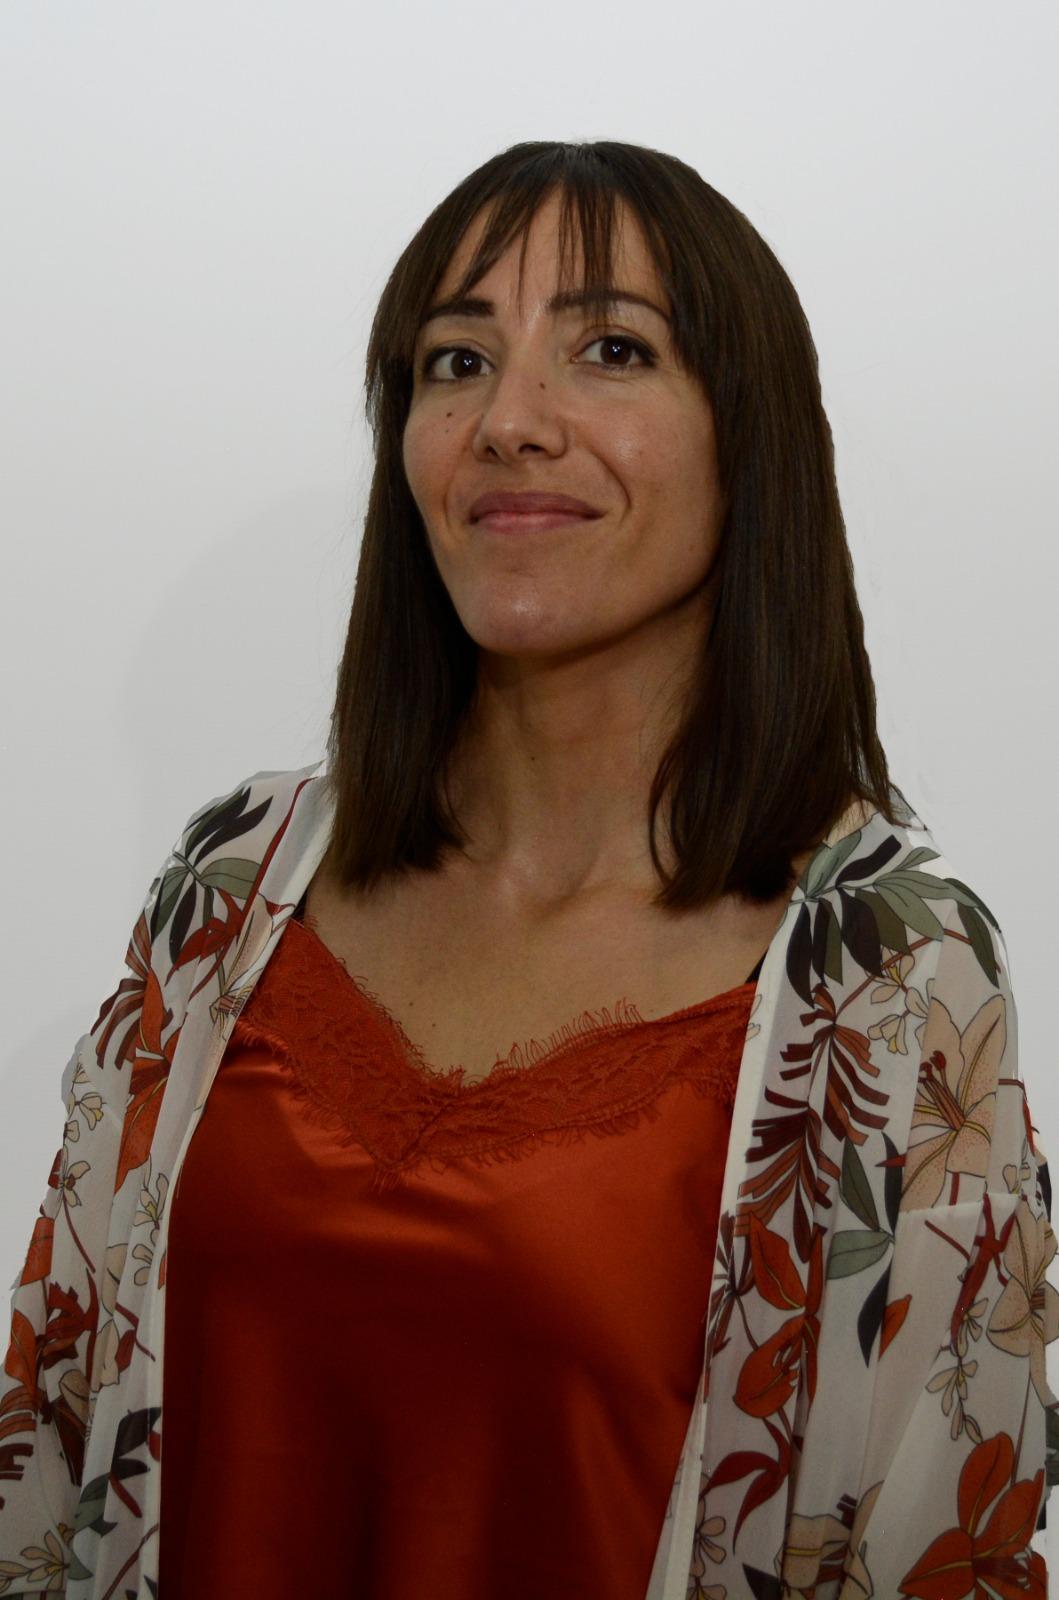 Ana Moliz Pedrosa